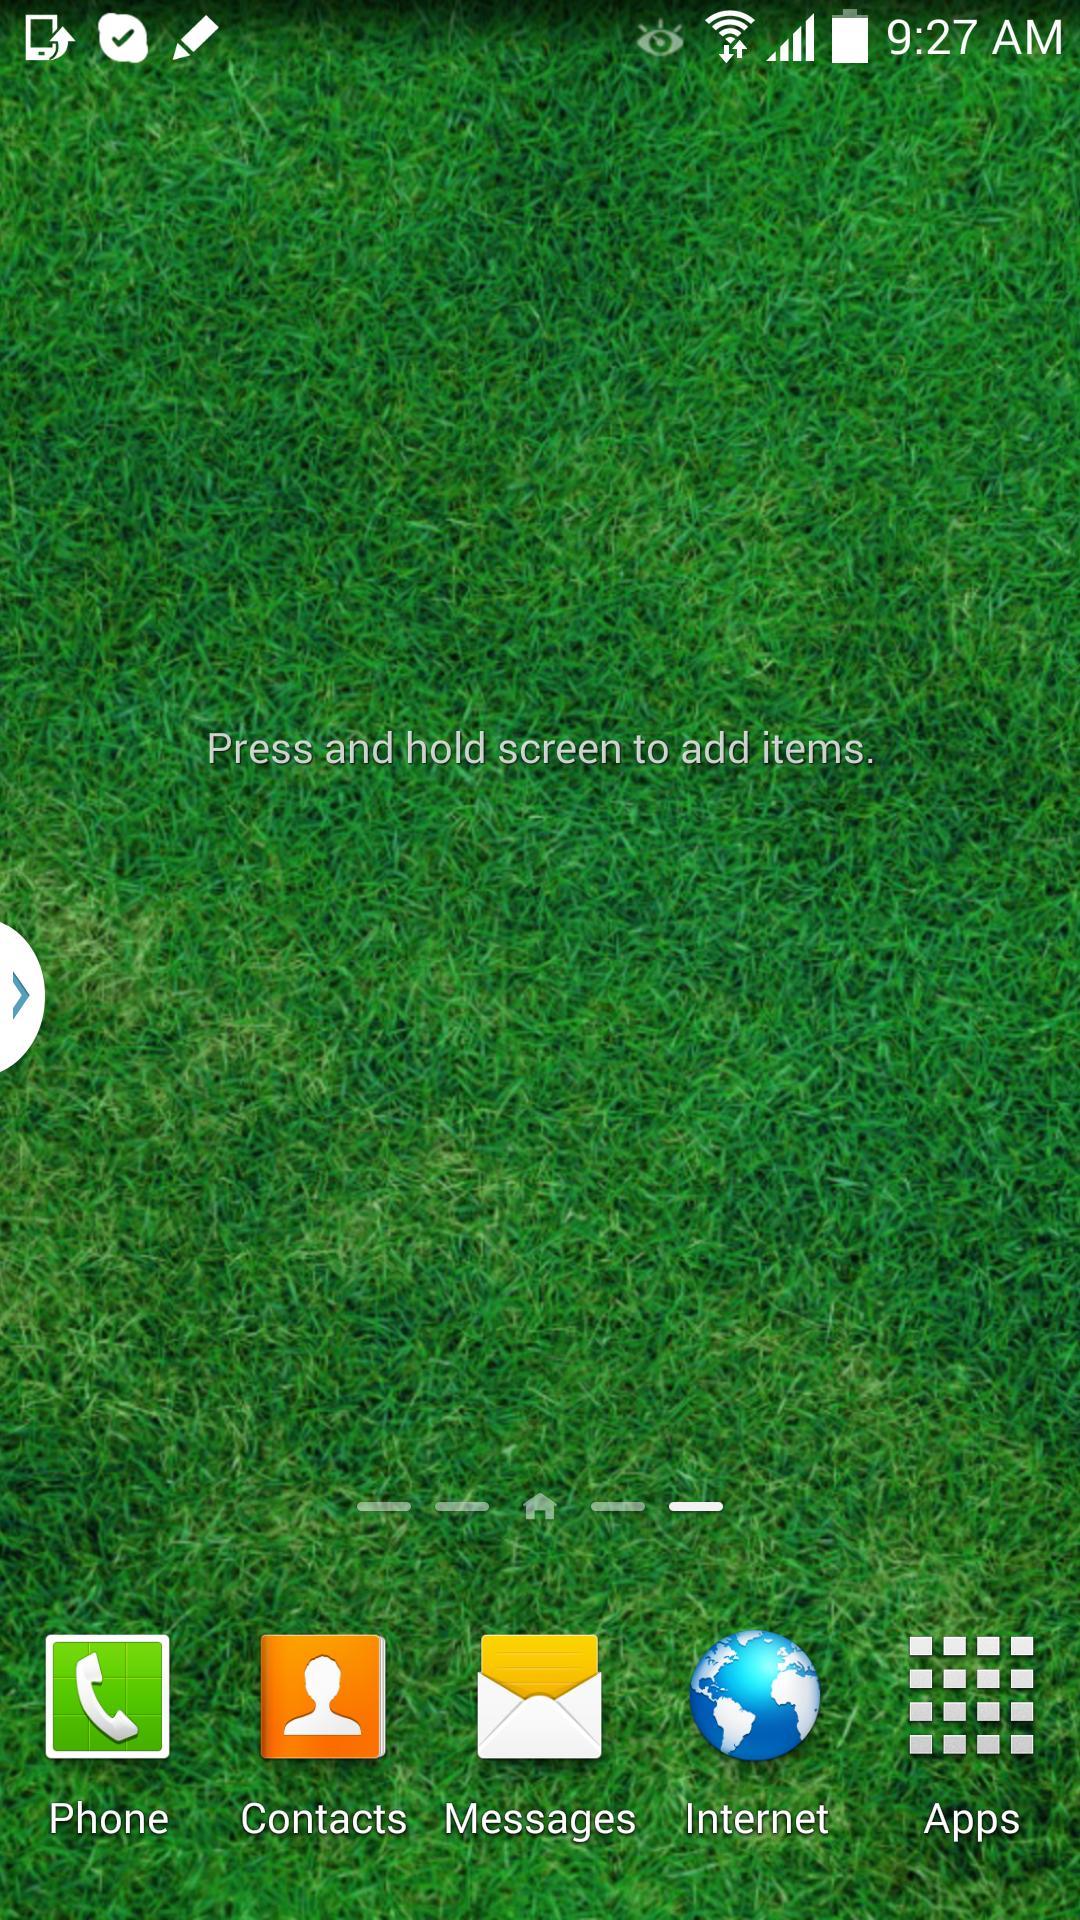 Unduh 6000+ Wallpaper Animasi Oppo Neo 7 HD Paling Baru